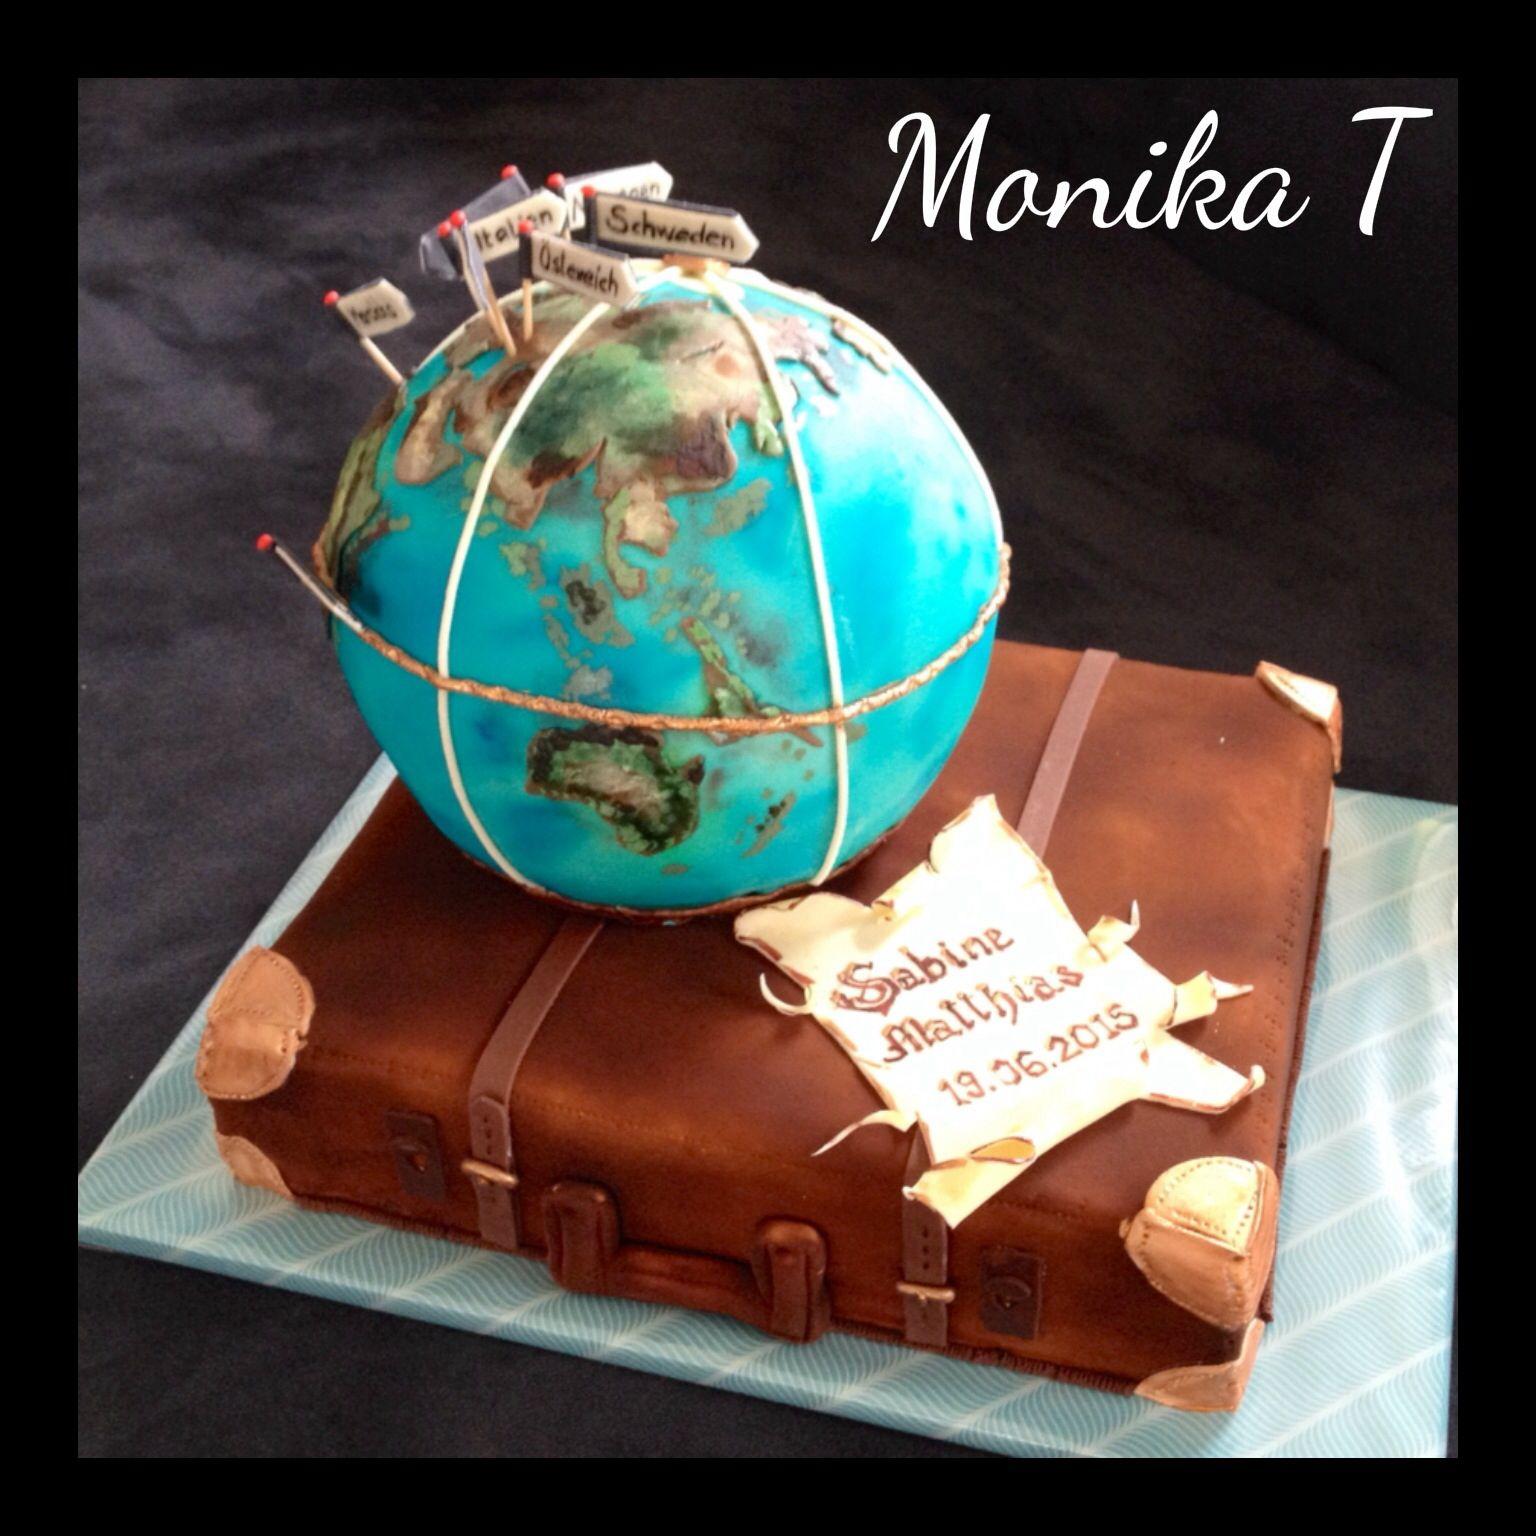 Globus Torte Motivtorte Fondant Torte Koffer Kuchen Globus Kuchen Hochzeitstorte Urlaub